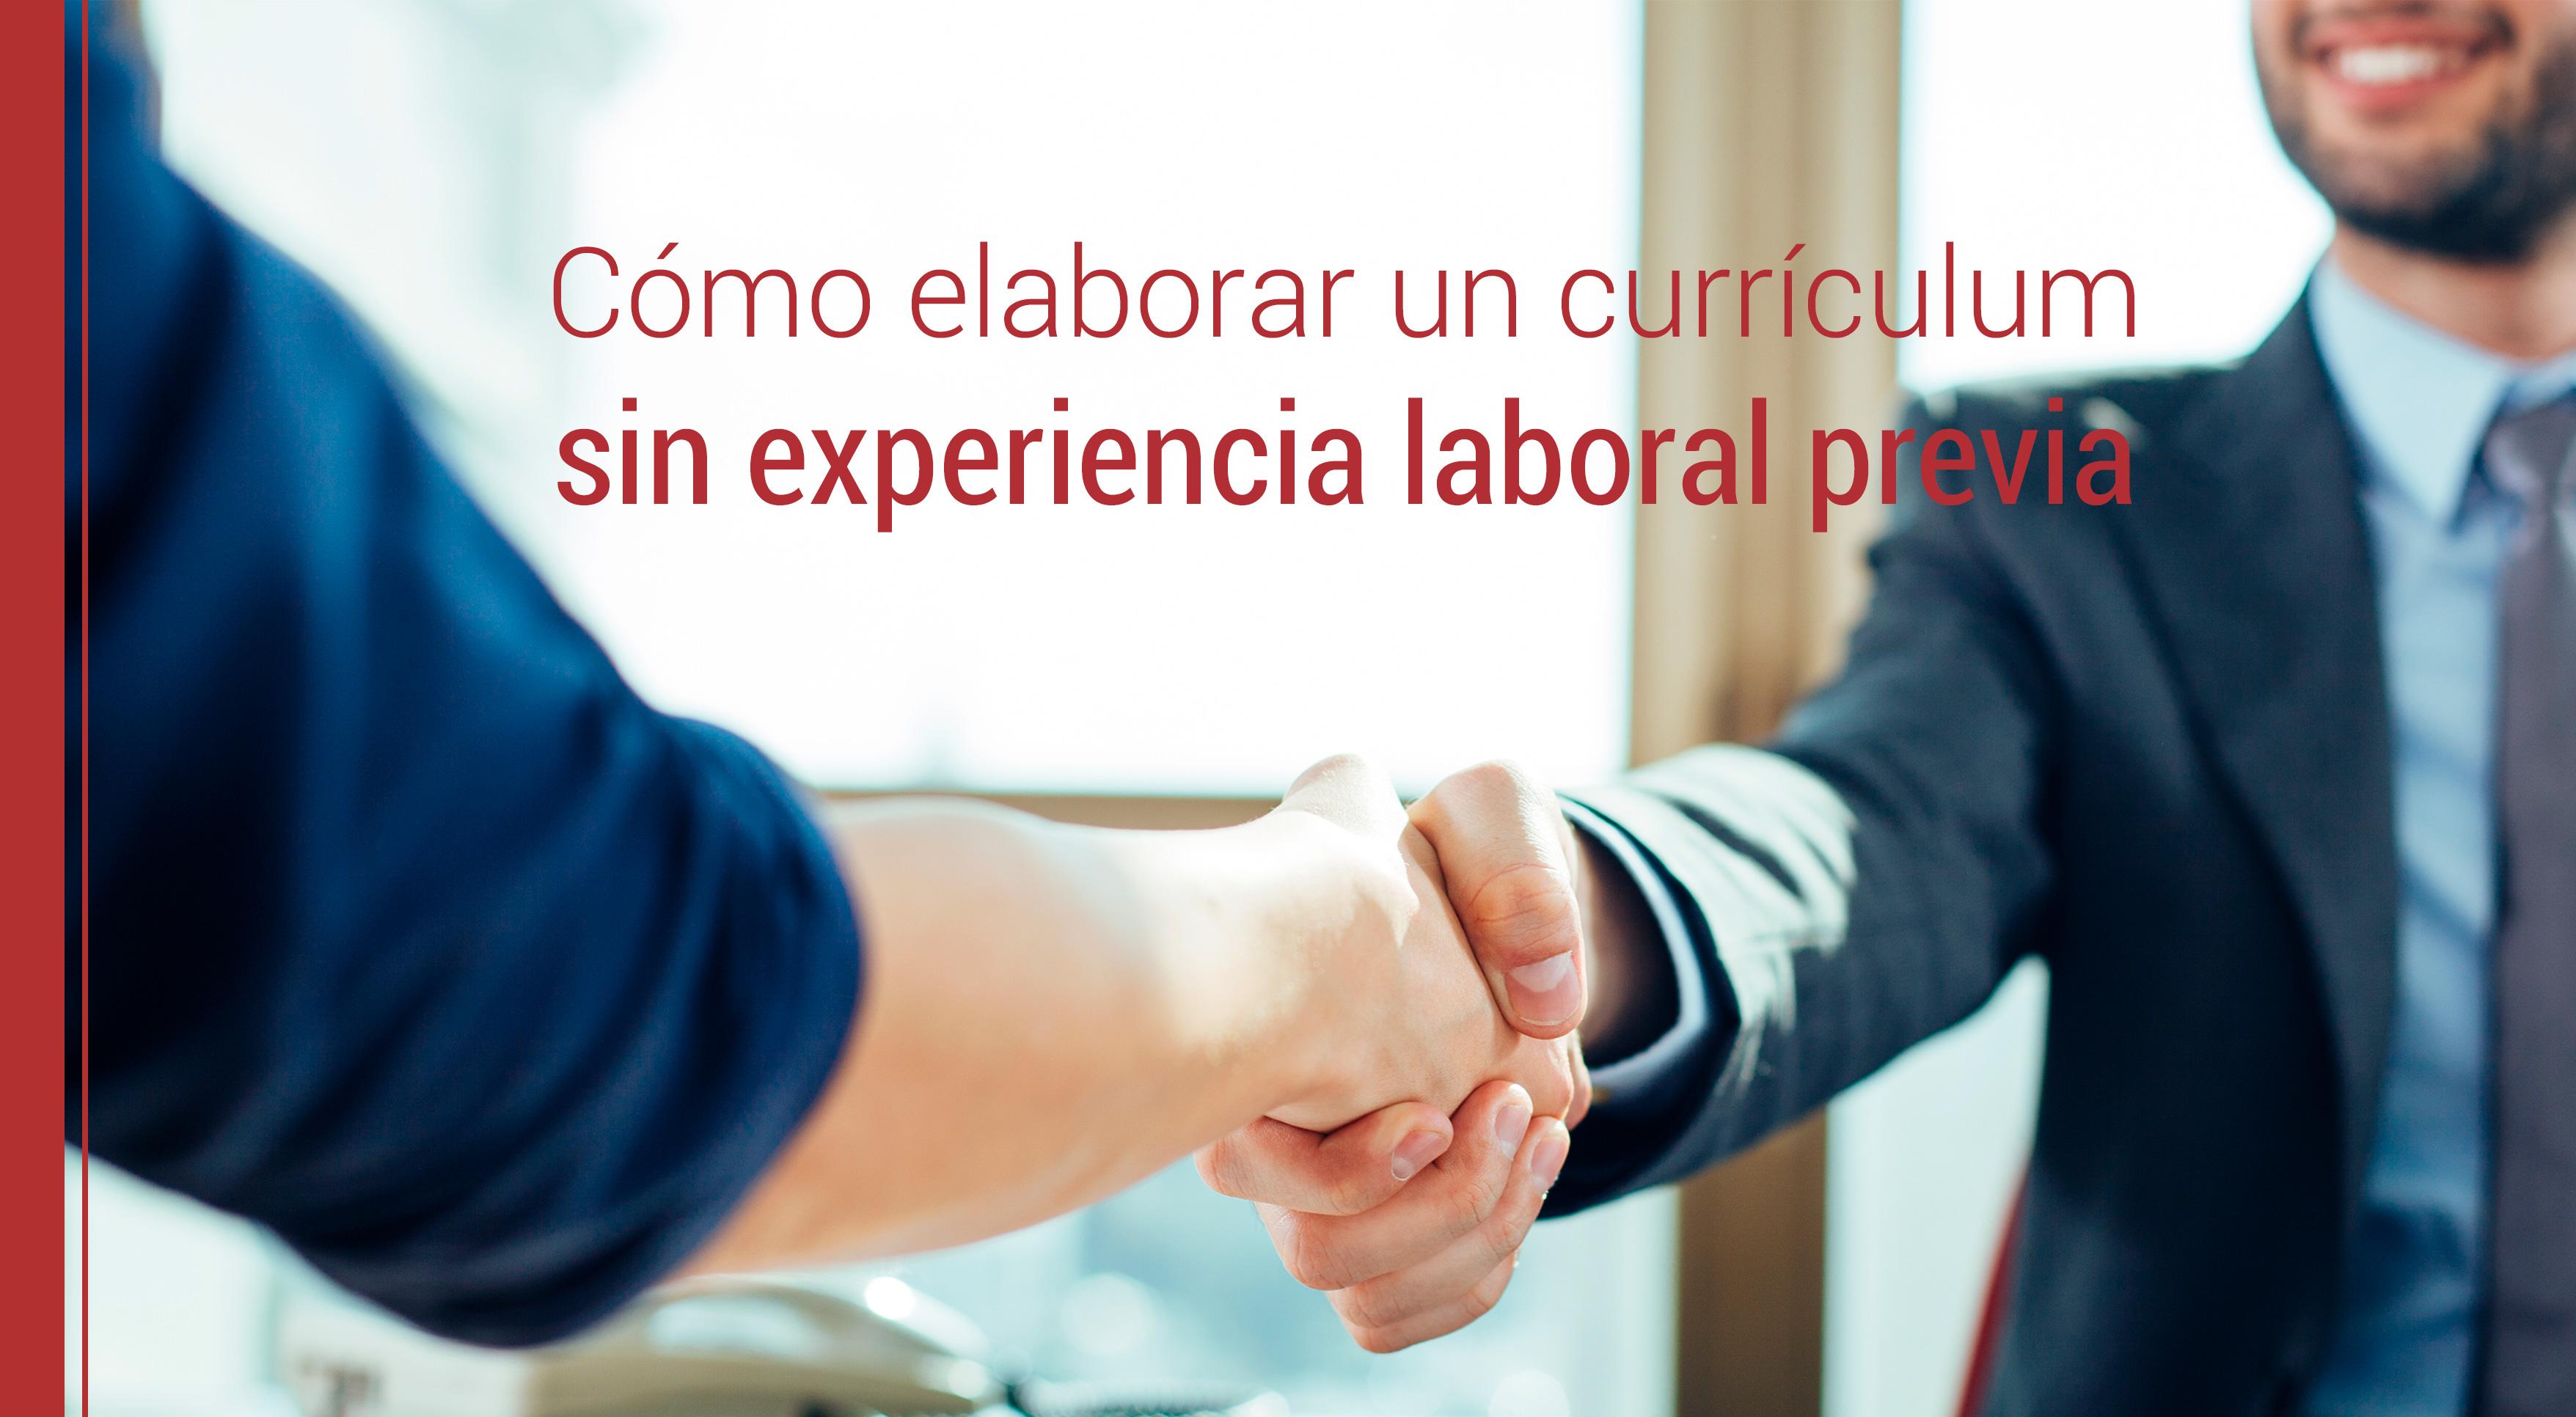 elaborar-curriculum-sin-experiencia-laboral Cómo elaborar un currículum sin experiencia laboral previa